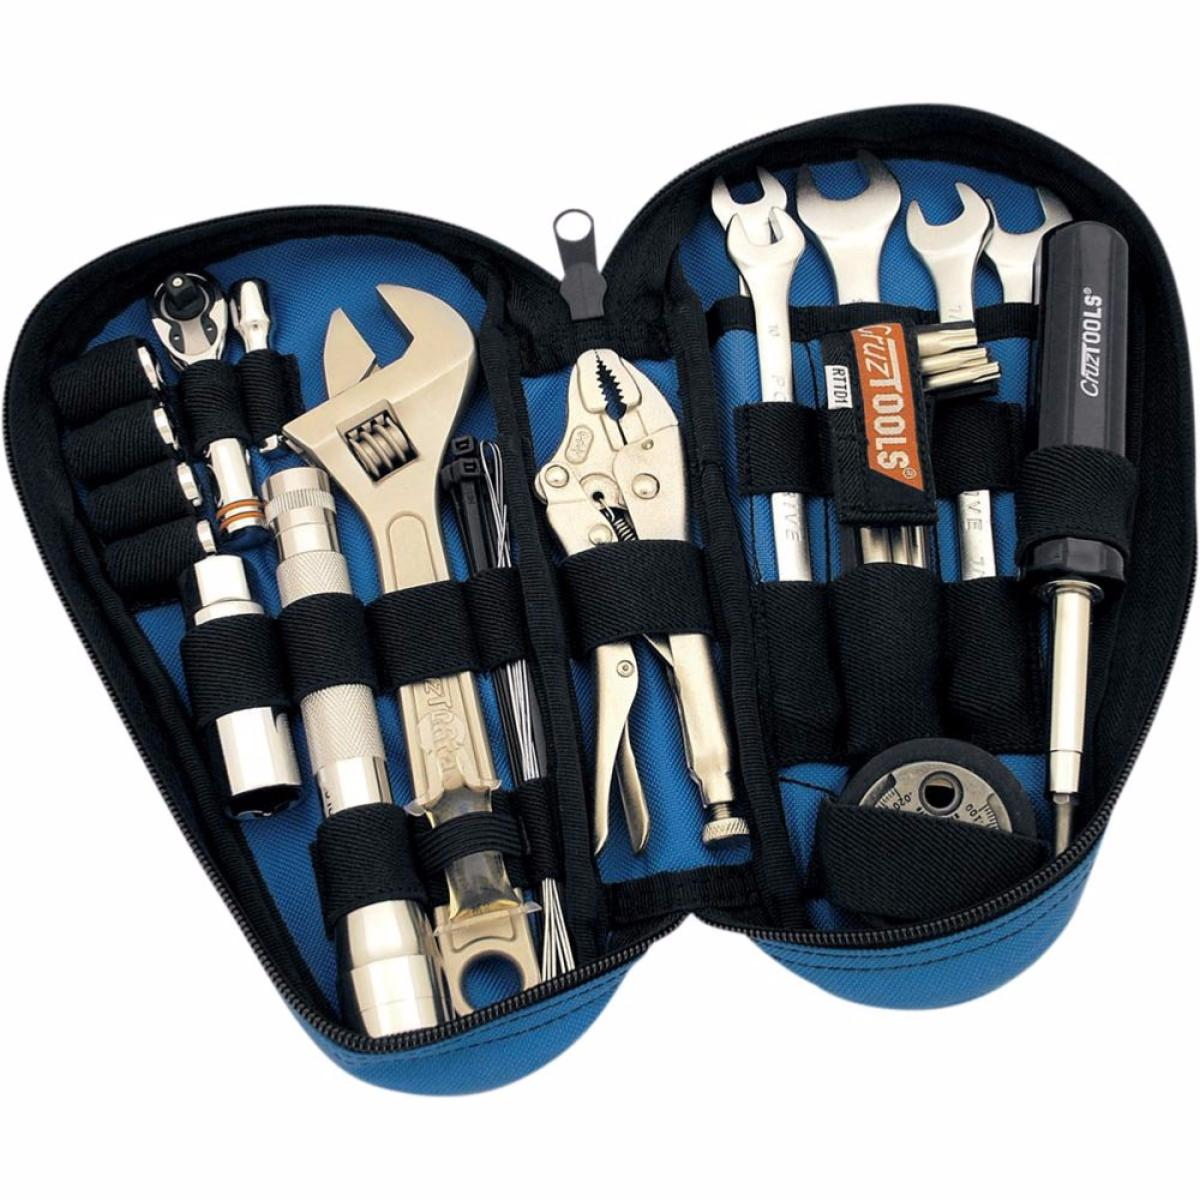 Kit trousse outils mini pour Harley